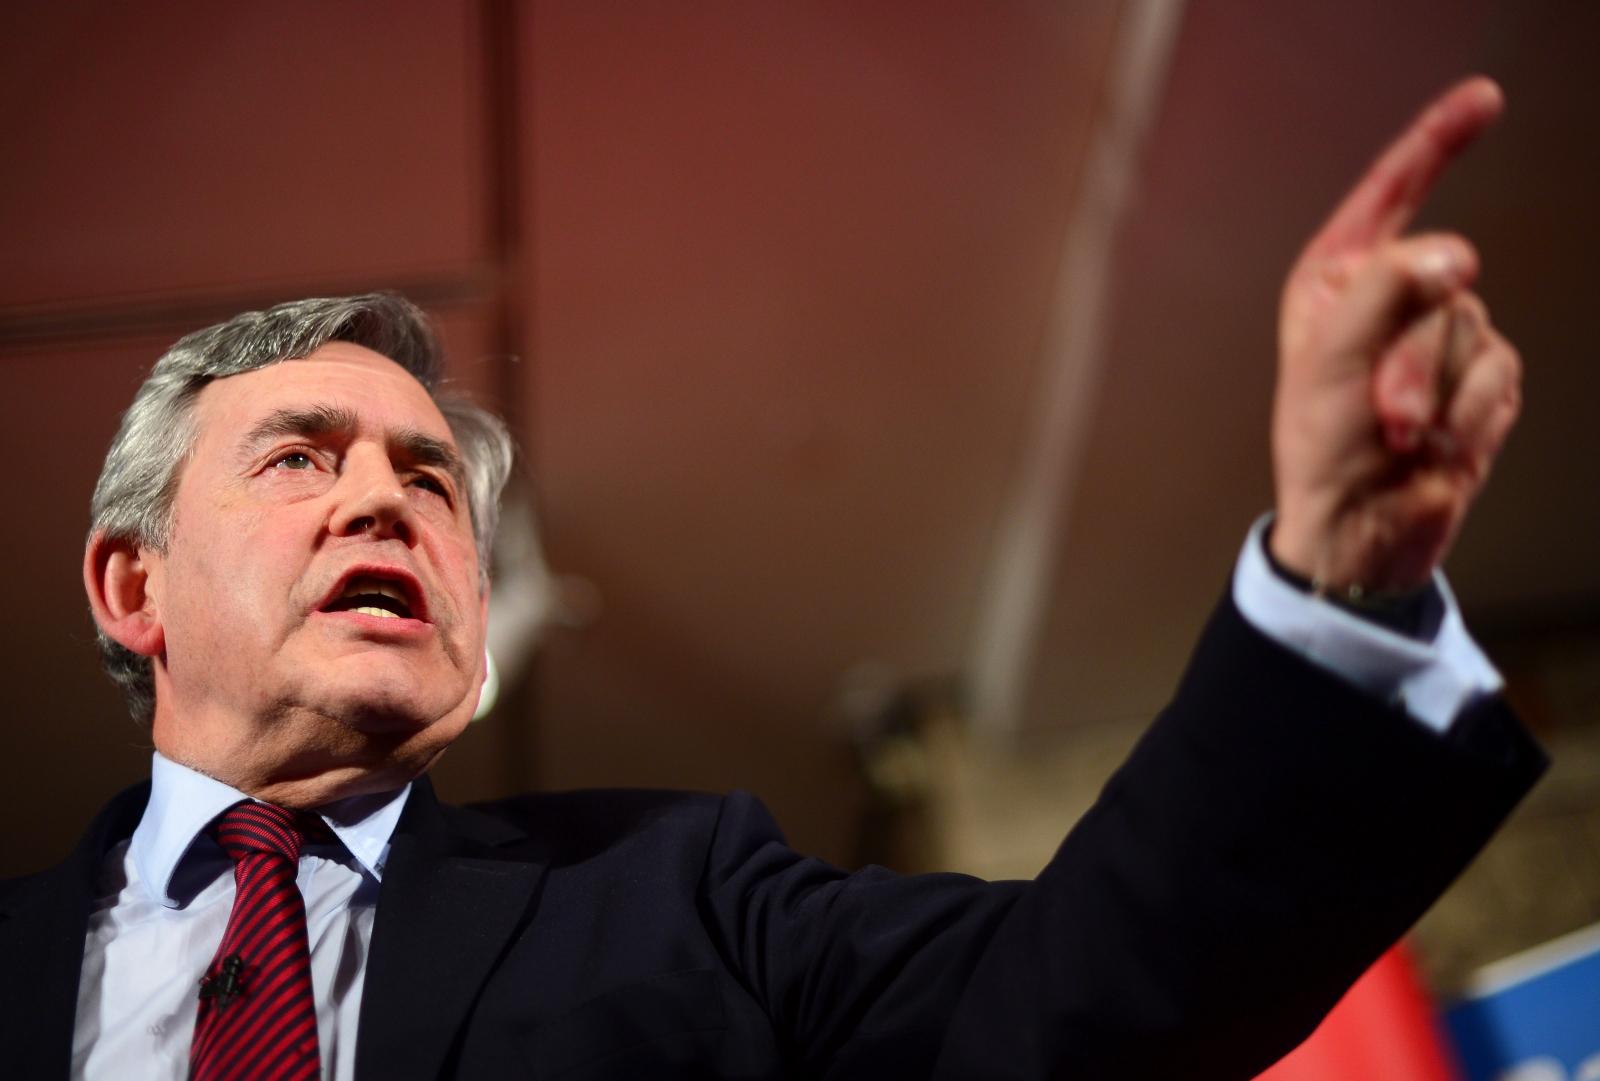 Gordon Brown London speech